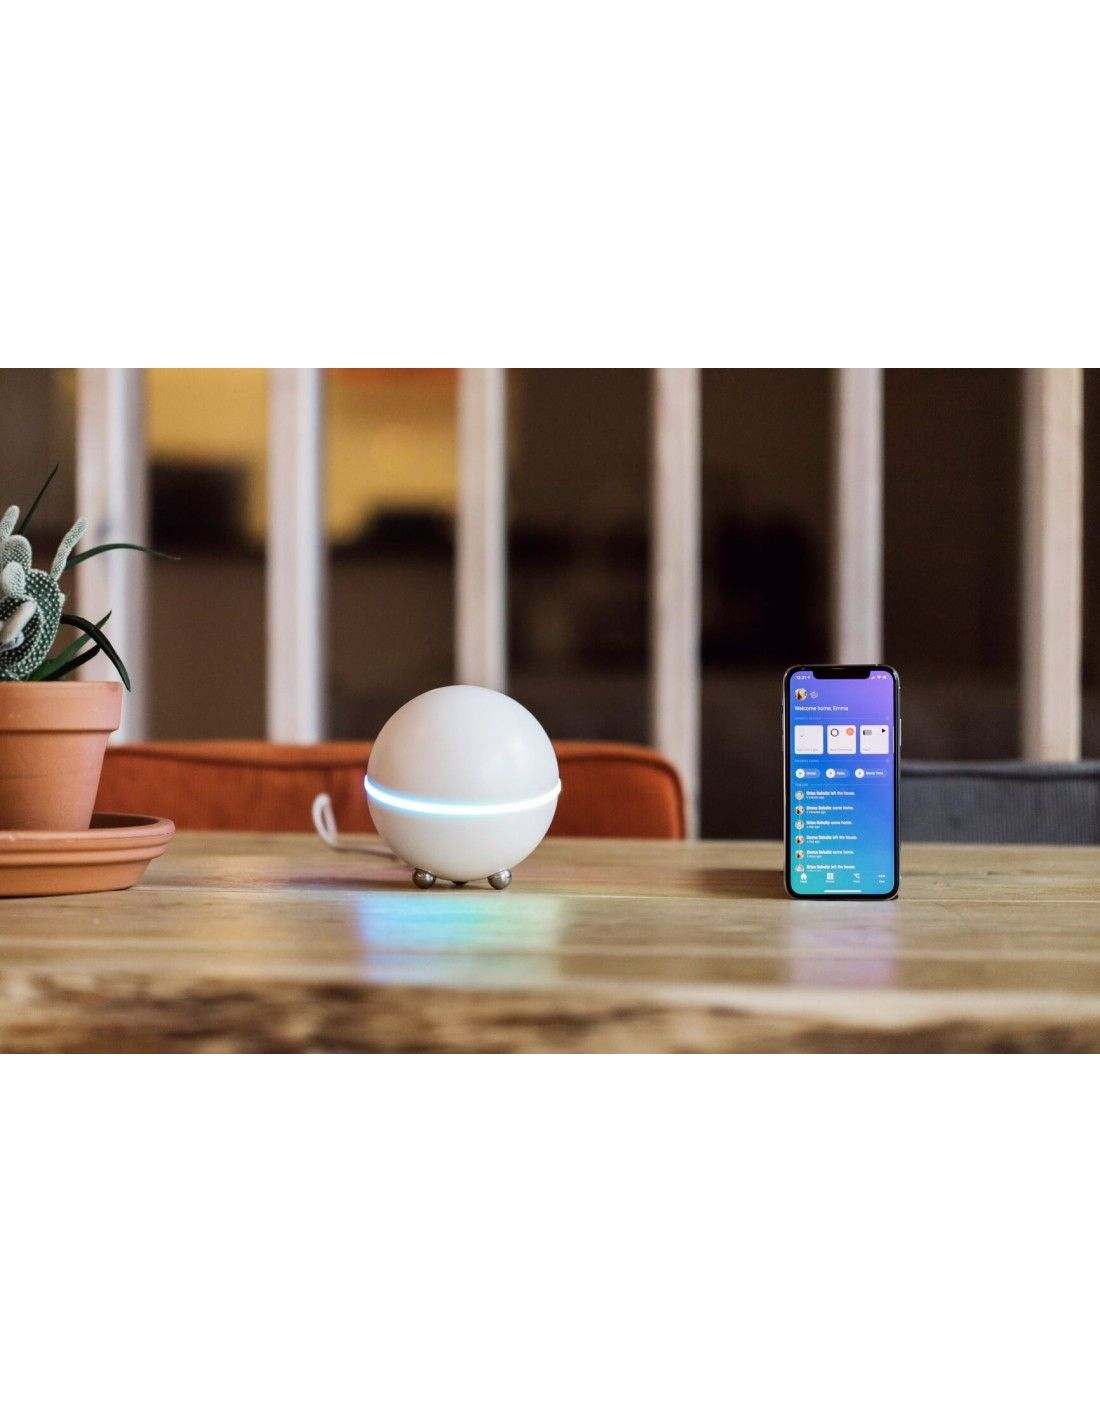 Athom - Home automation controller Homey